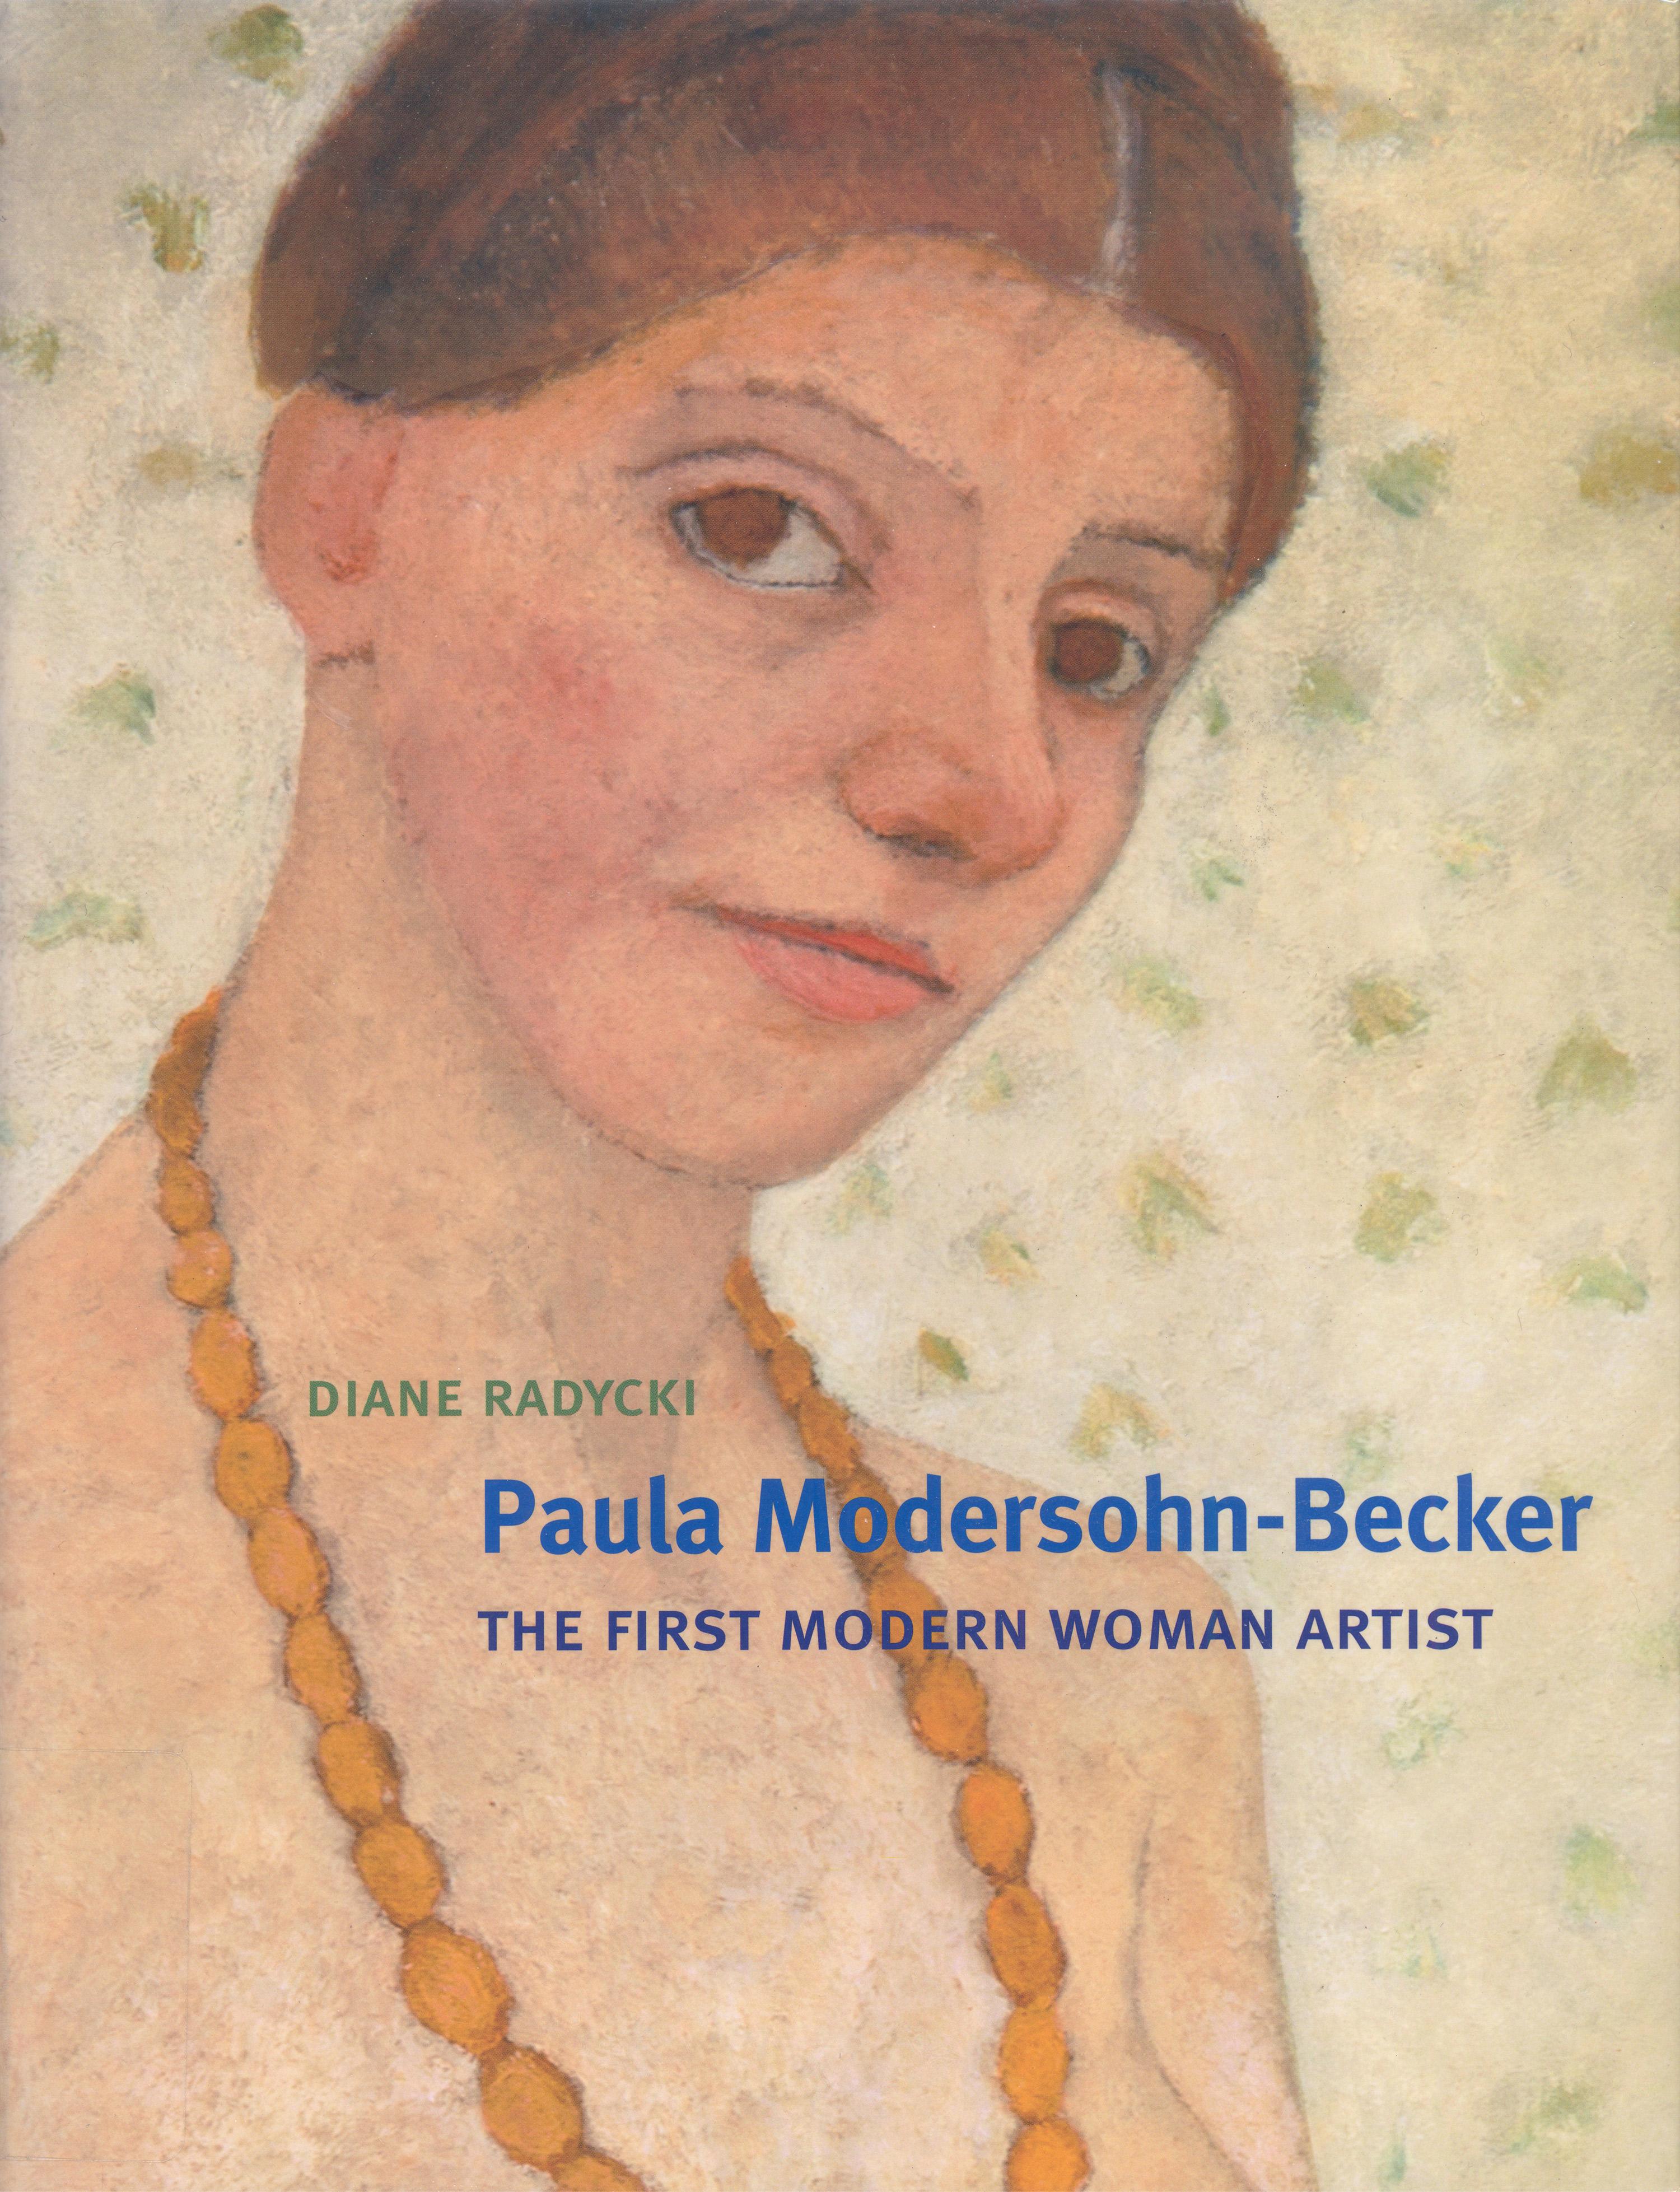 Paula Modersohn-Becker: The First Modern Woman Artist book by Dr. Diane Radycki, 2013,Yale University Press